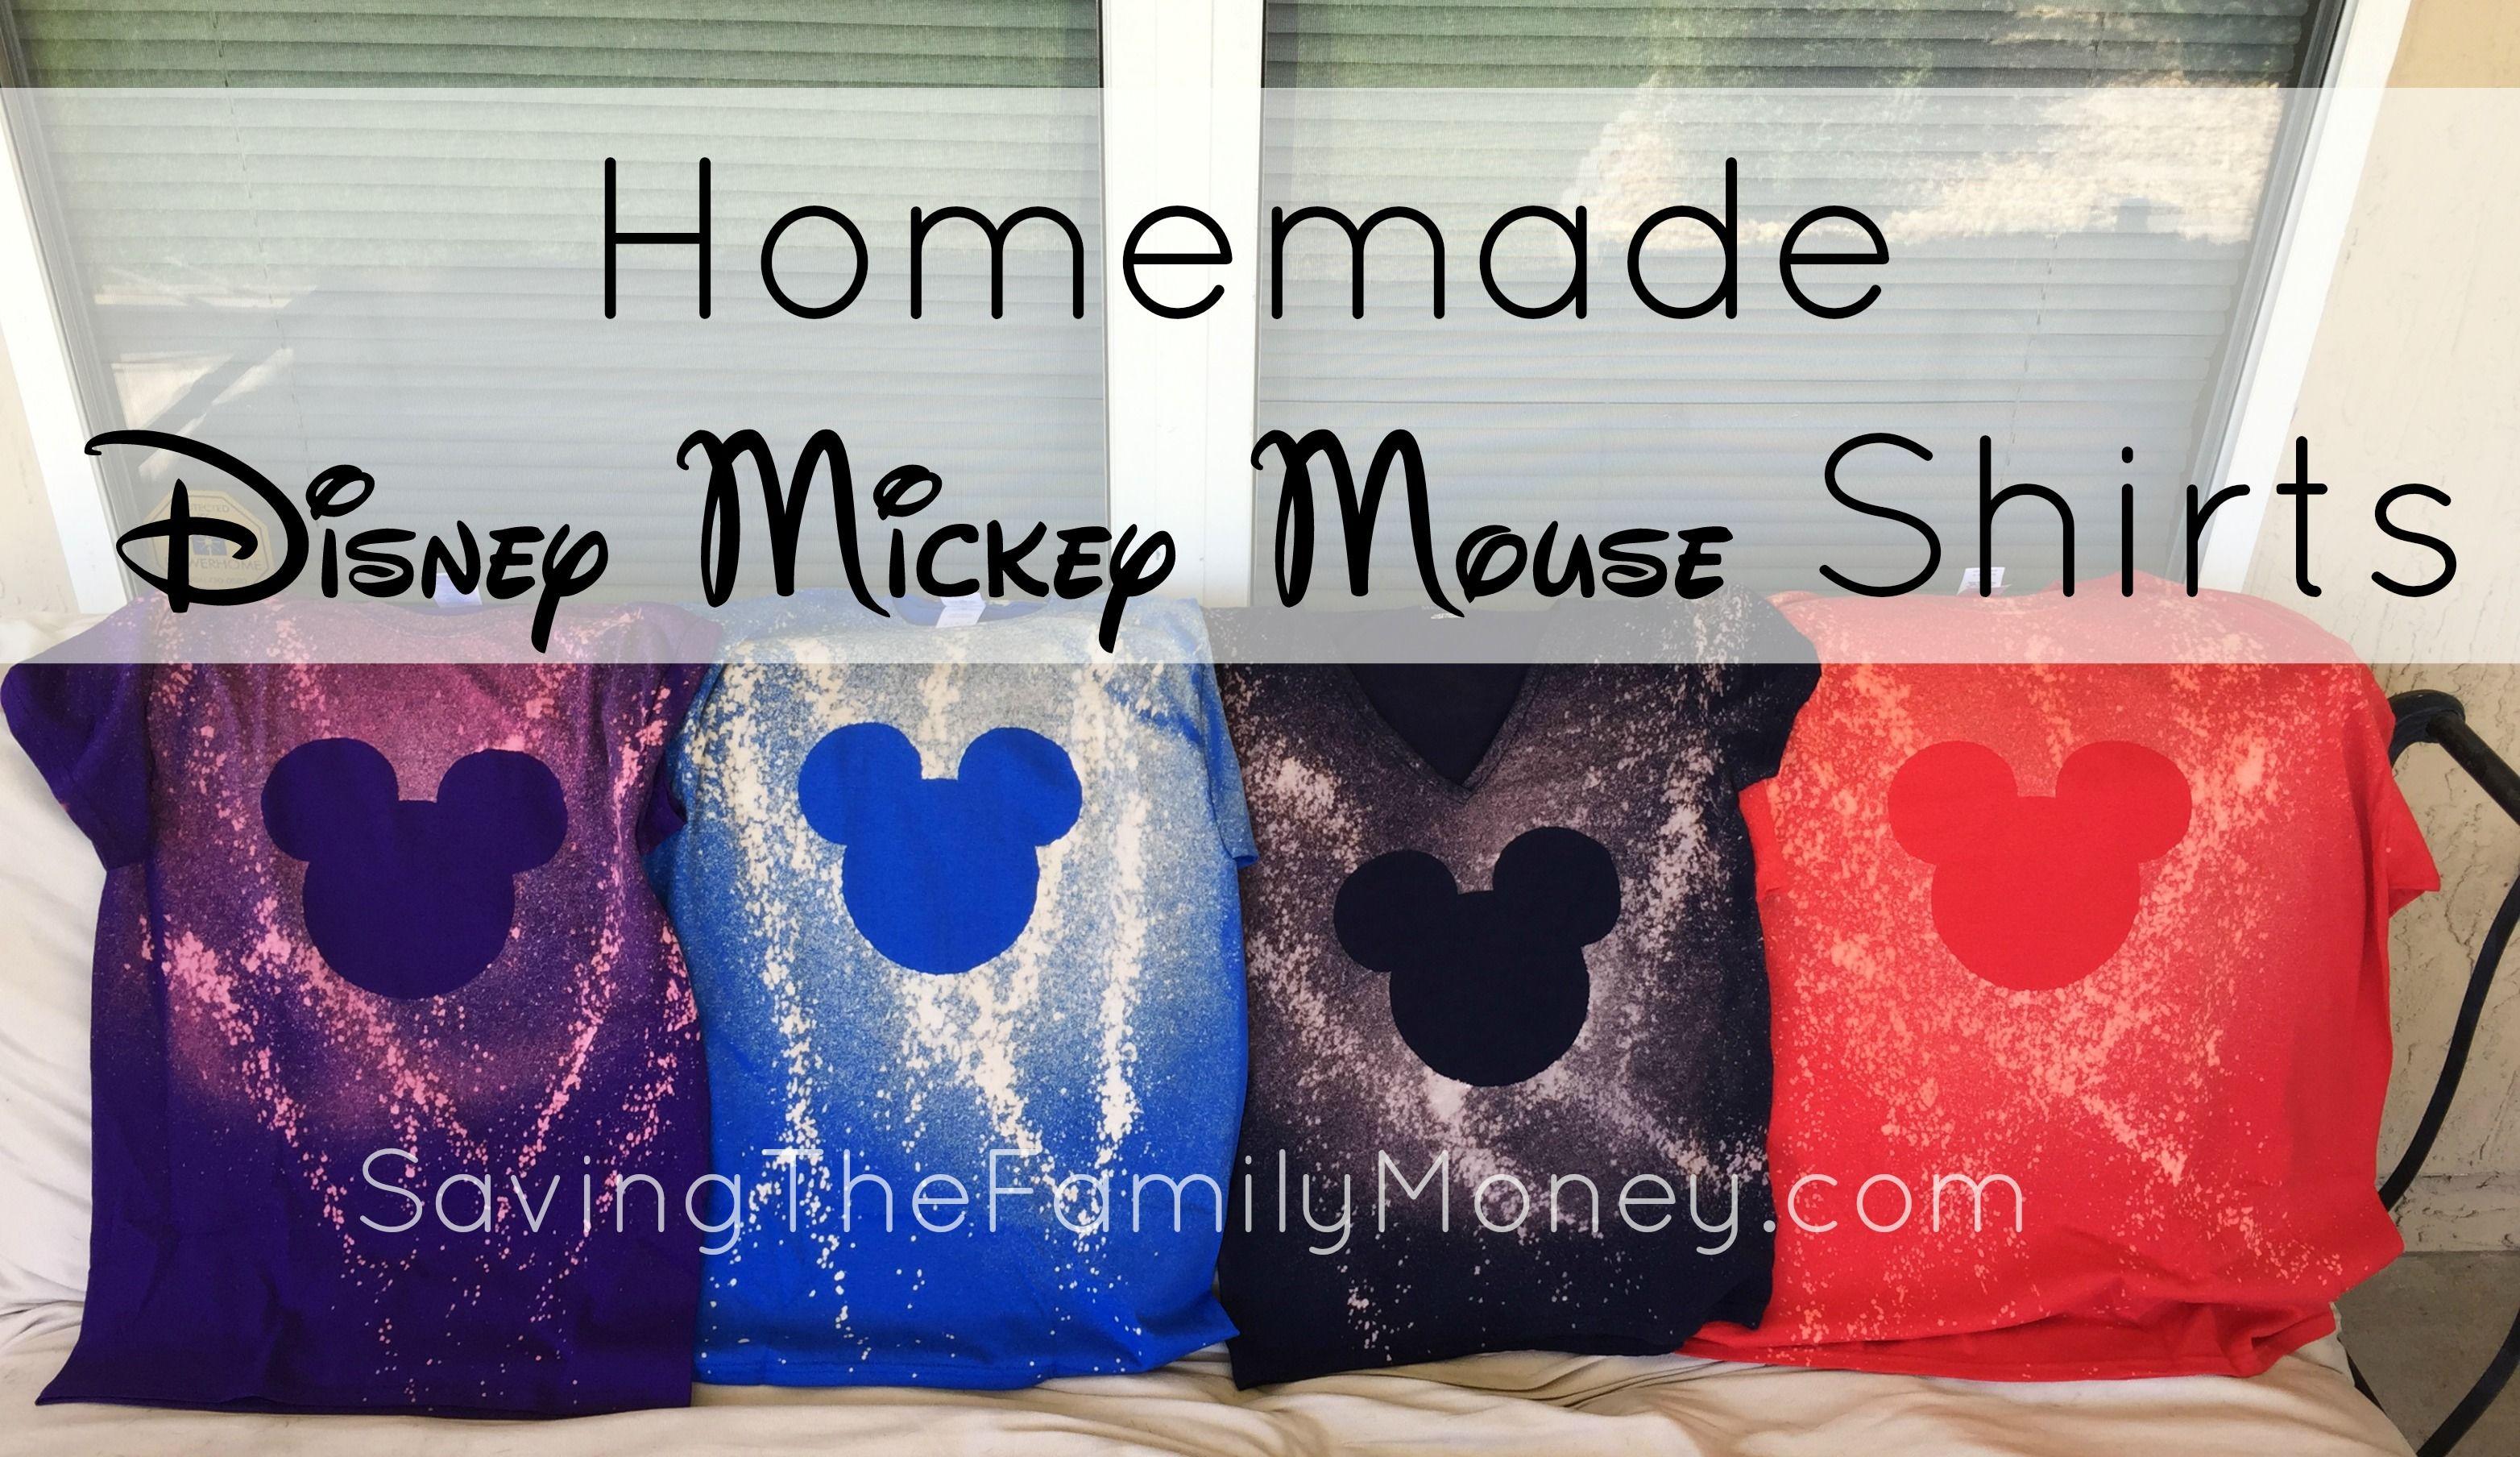 Homemade Disney Mickey Mouse Shirts